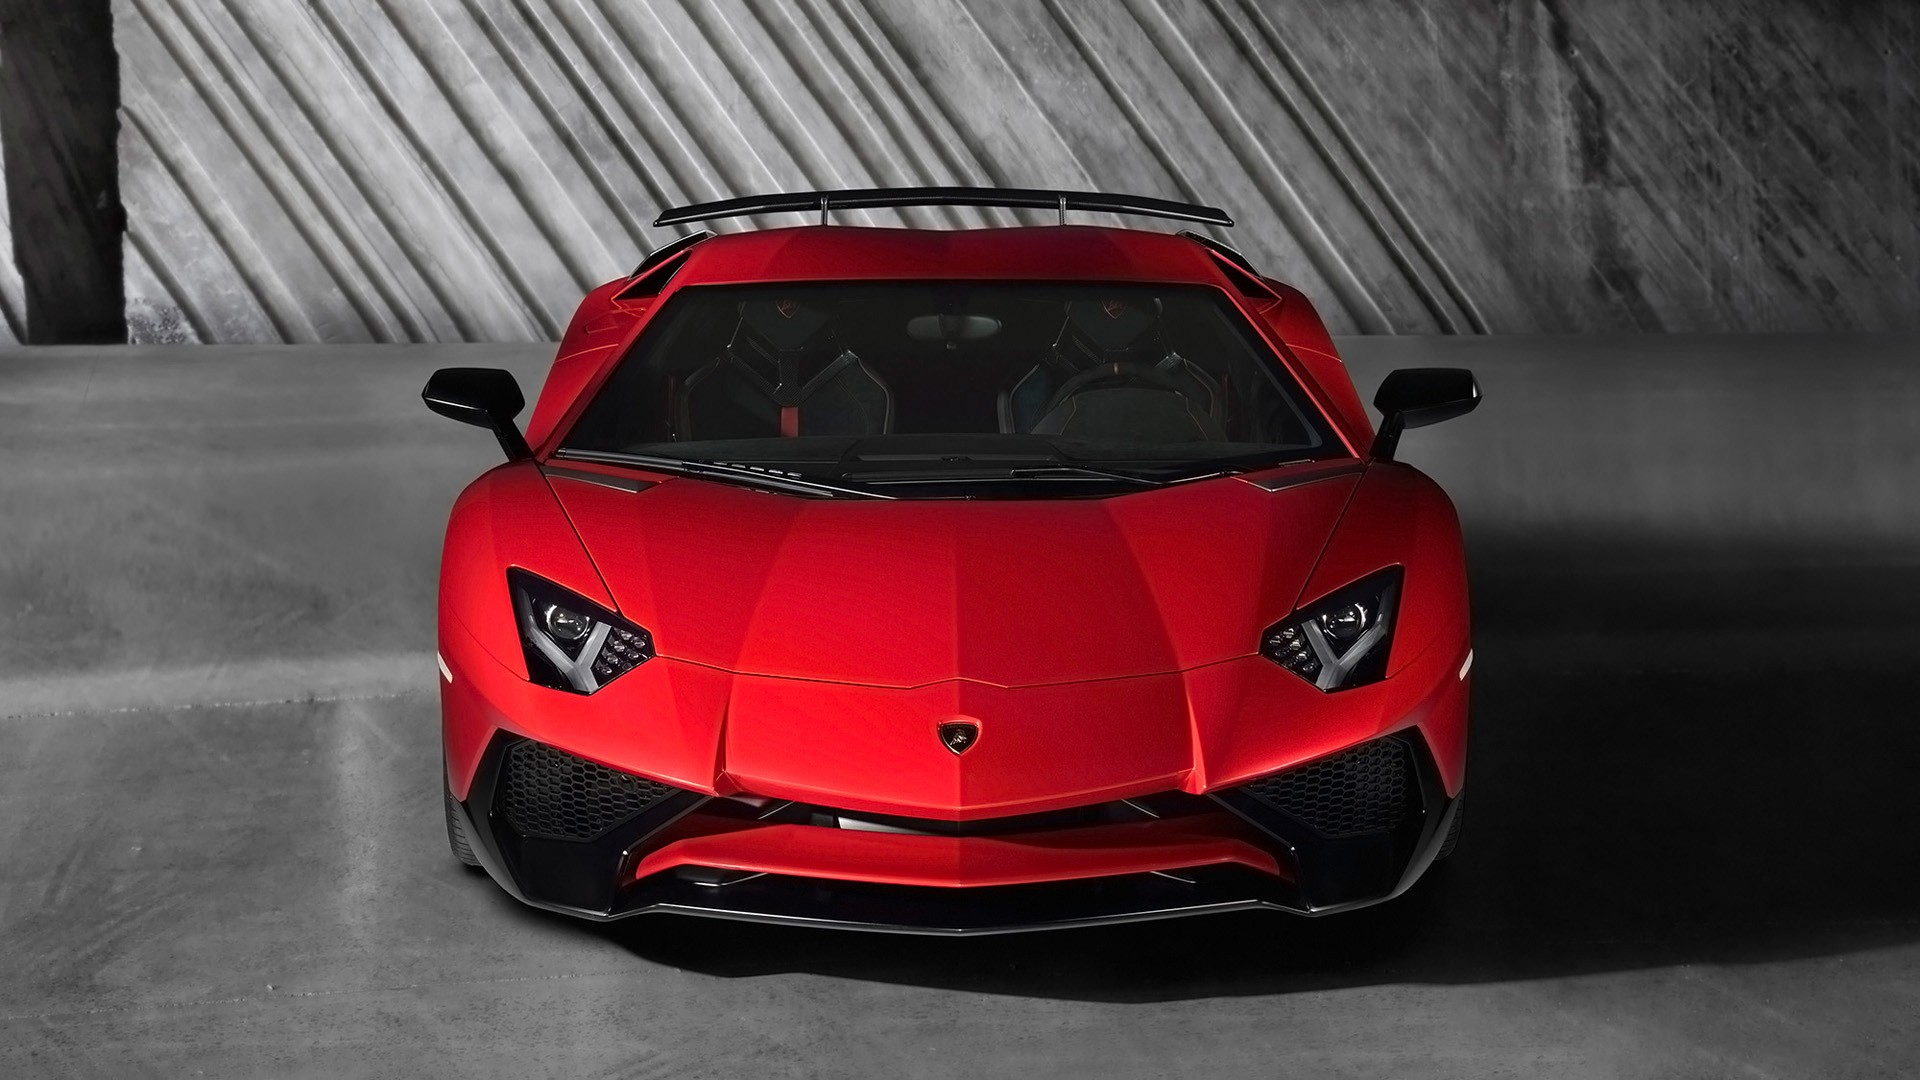 2017 Lamborghini Aventador Lp750 4 Superveloce >> 2015 Lamborghini Aventador LP750 4 Superveloce 3 Wallpaper | HD Car Wallpapers | ID #5186